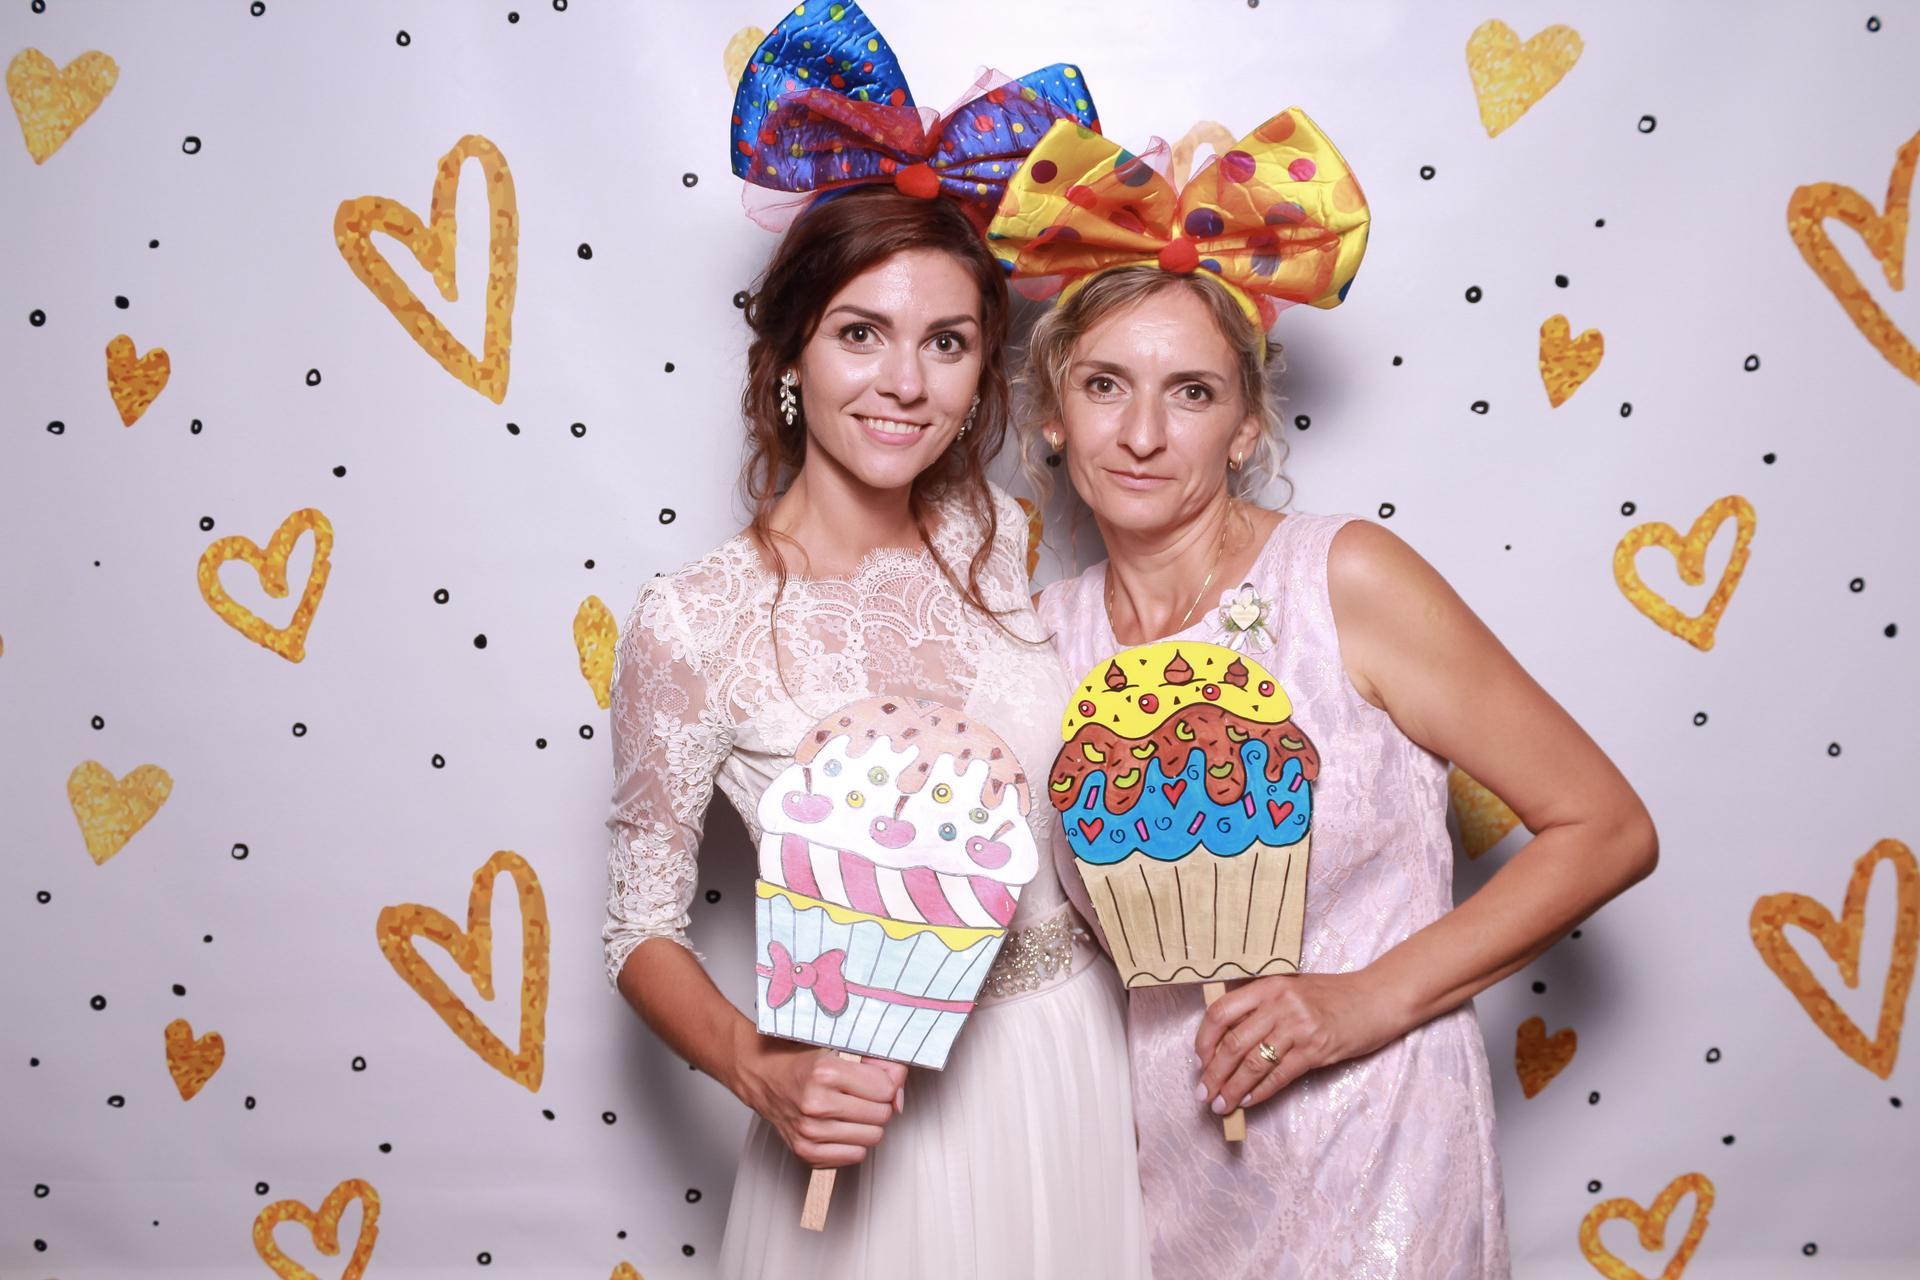 Wedding Time - ako dve sestry ♥